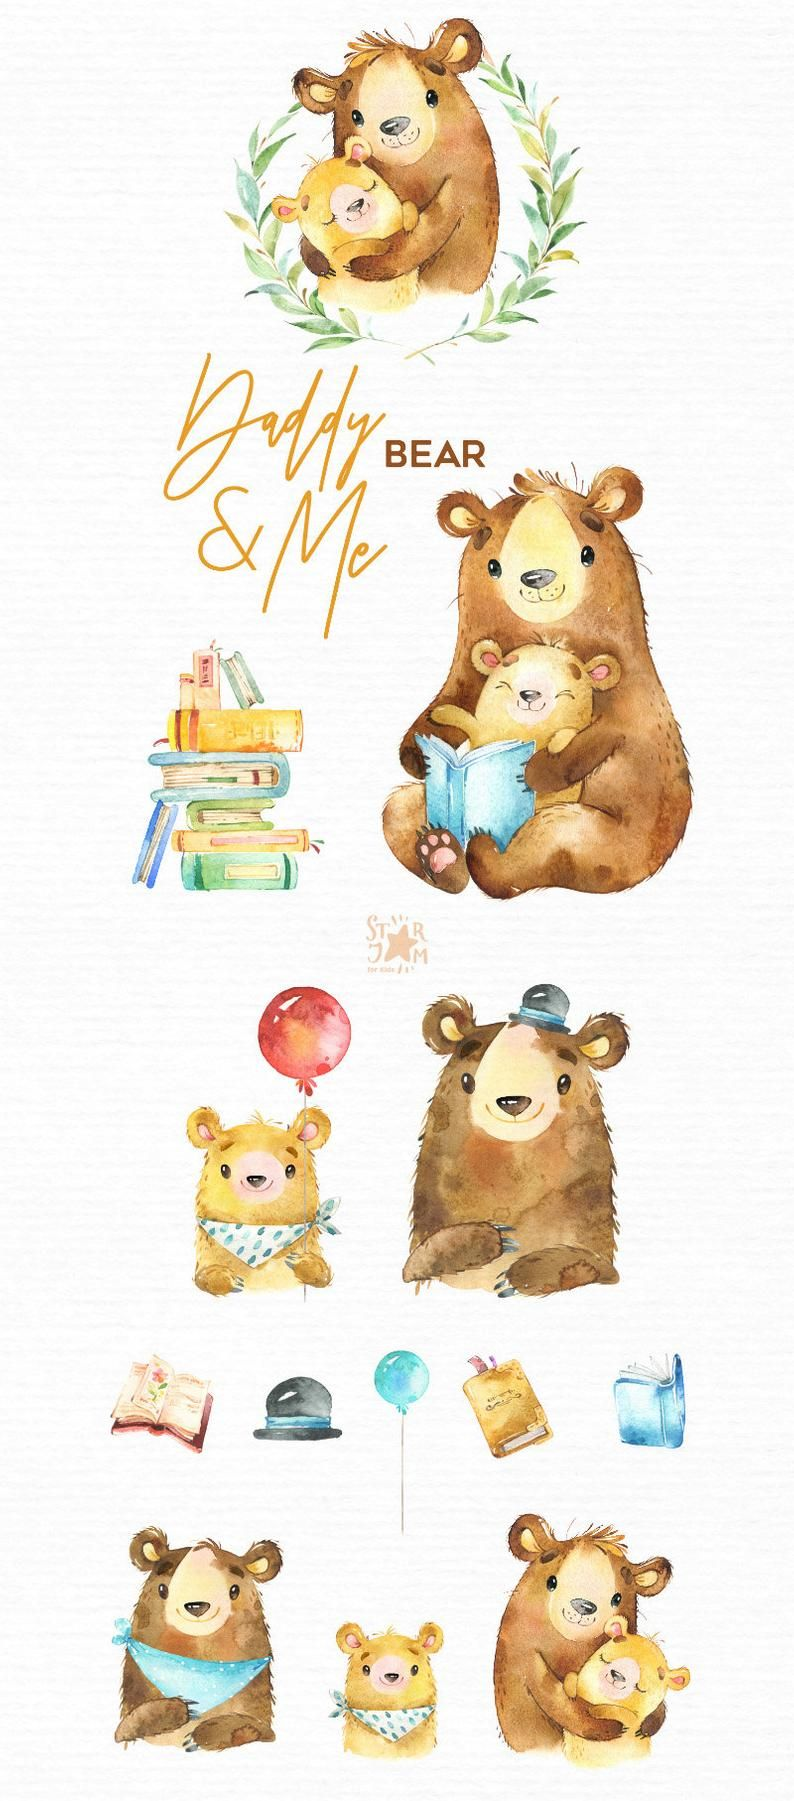 Papa Me Orso Animali Acquerello Animali Clipart Padre Etsy In 2020 Bear Watercolor Watercolor Animals Animal Clipart